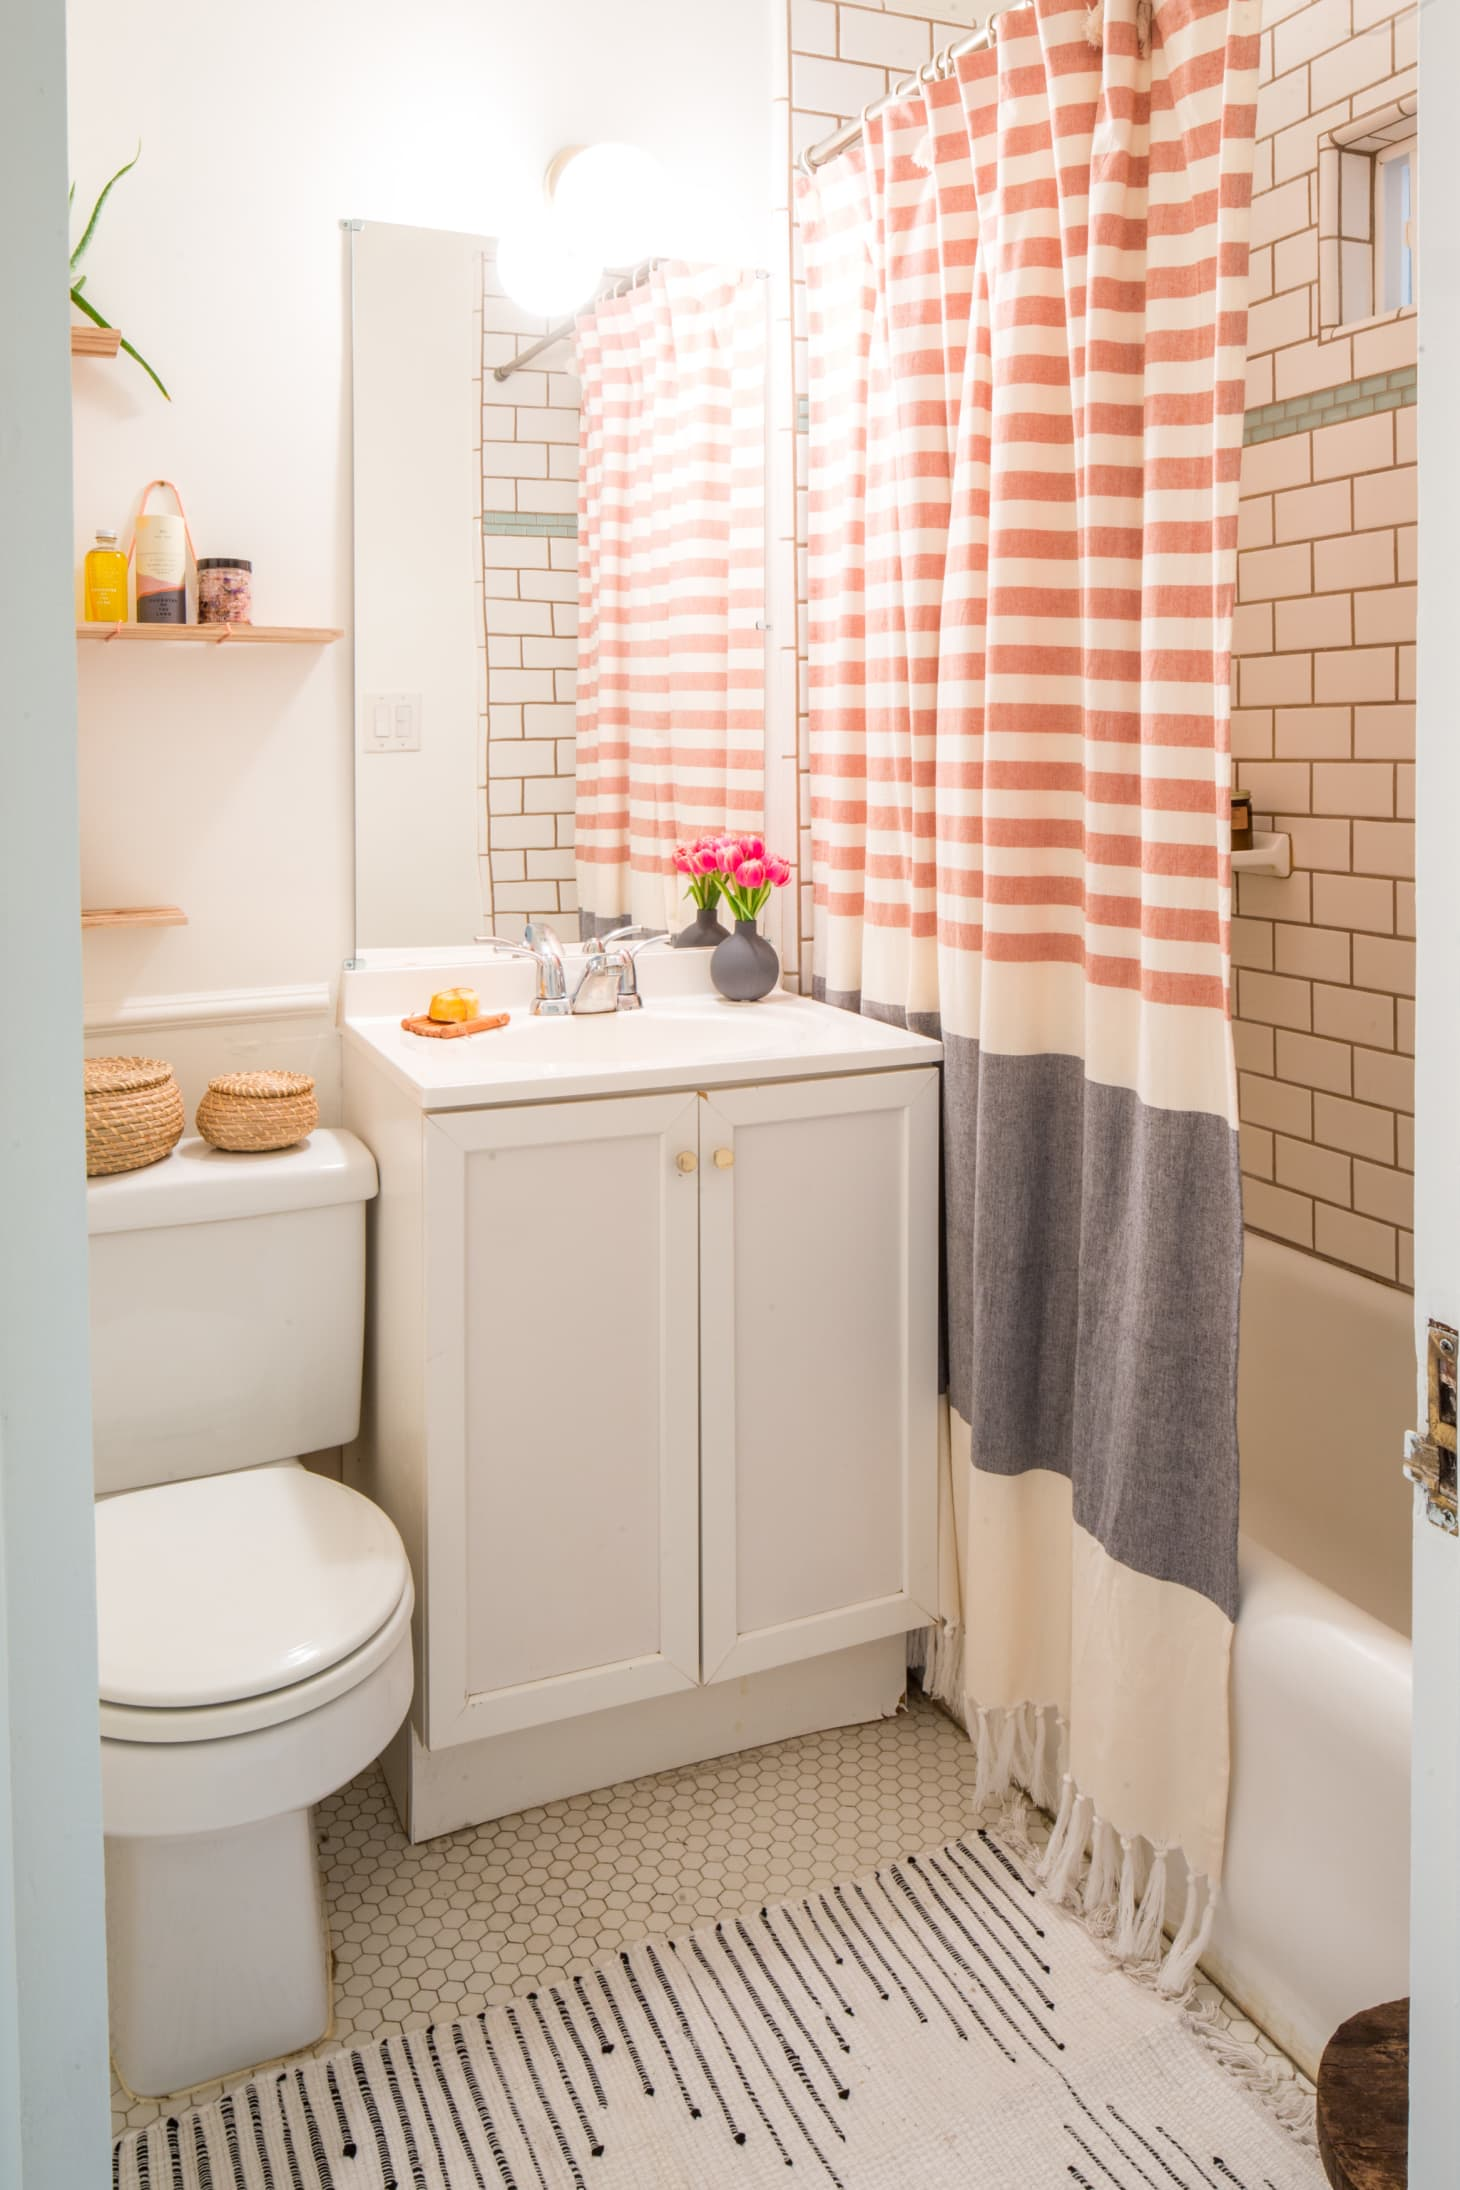 25 Small Bathroom Storage & Design Ideas - Storage ... on Small Apartment Bathroom  id=16966